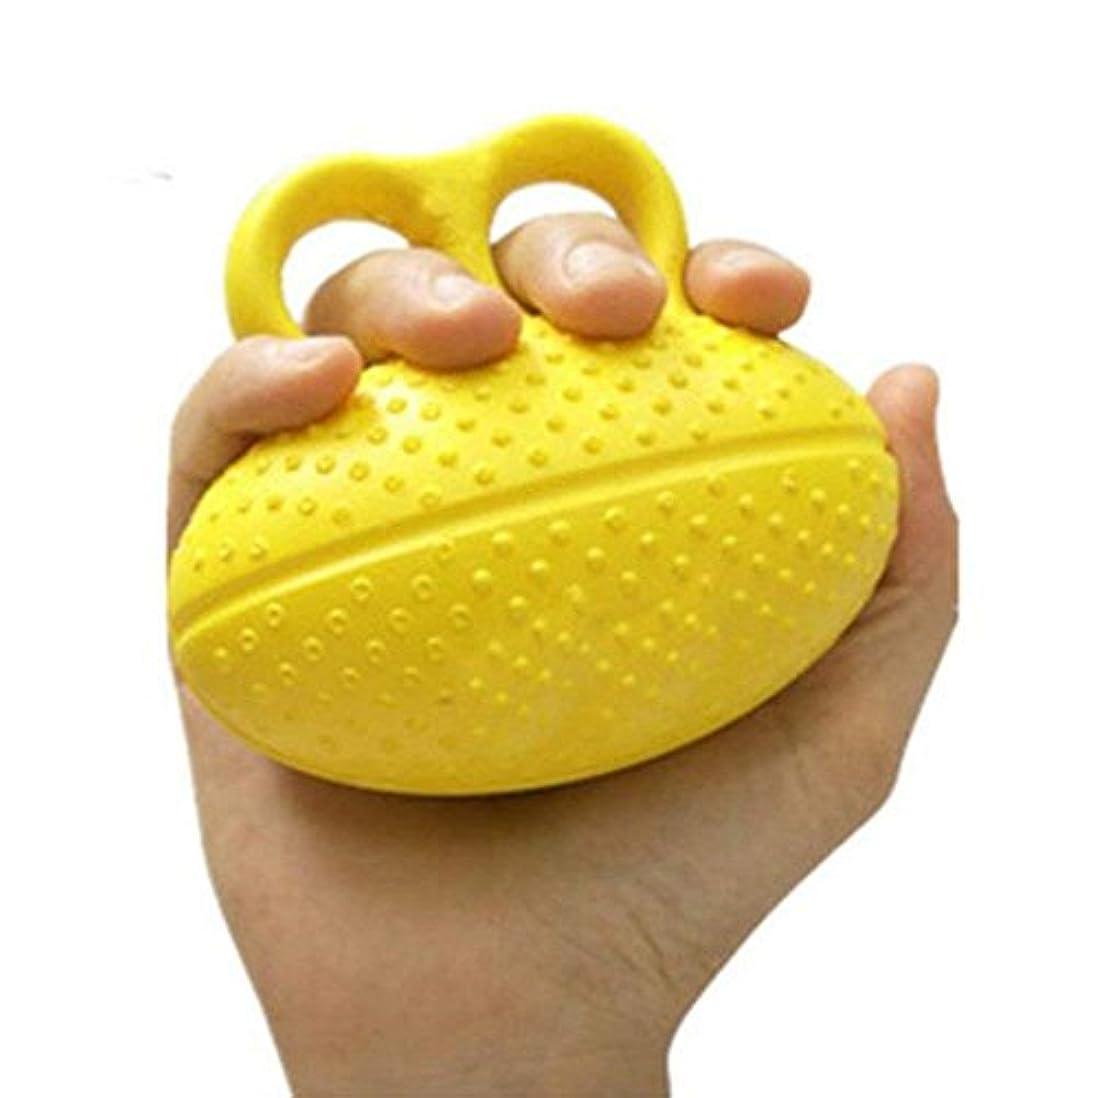 FC-工場 リハビリ ボール 器具 指の力 手 握力 鍛える 回復 トレーニング グッズ 脳梗塞 脳卒中 介護介護 リハビリ トレーニング グッズ